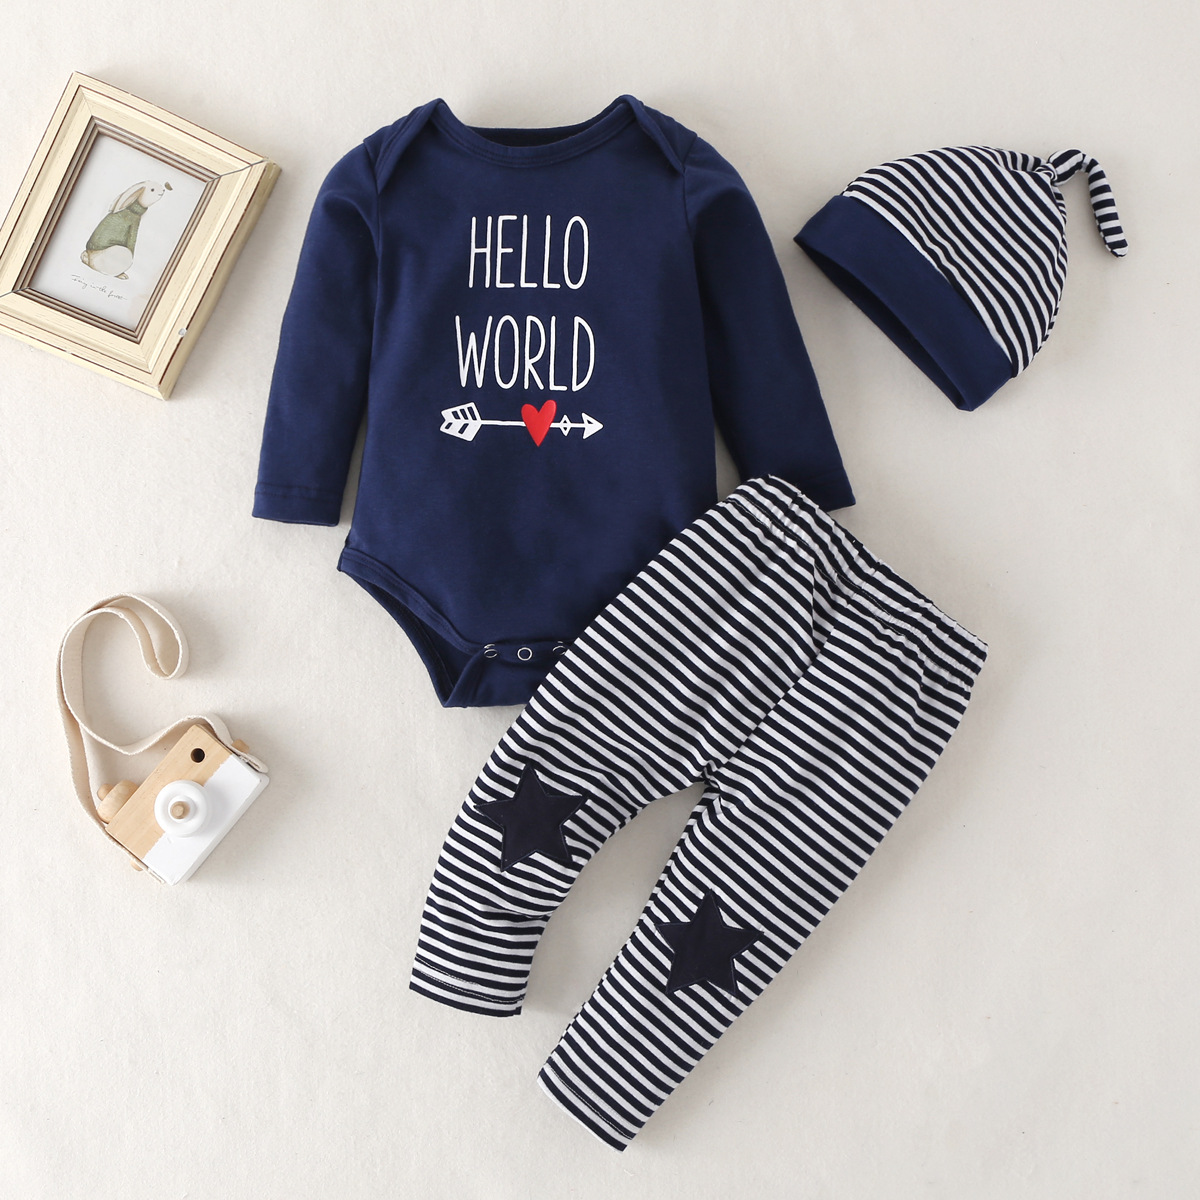 Boutique Newborn Baby Girls Sister Tops Romper Pants 3Pcs Outfits Set Clothes